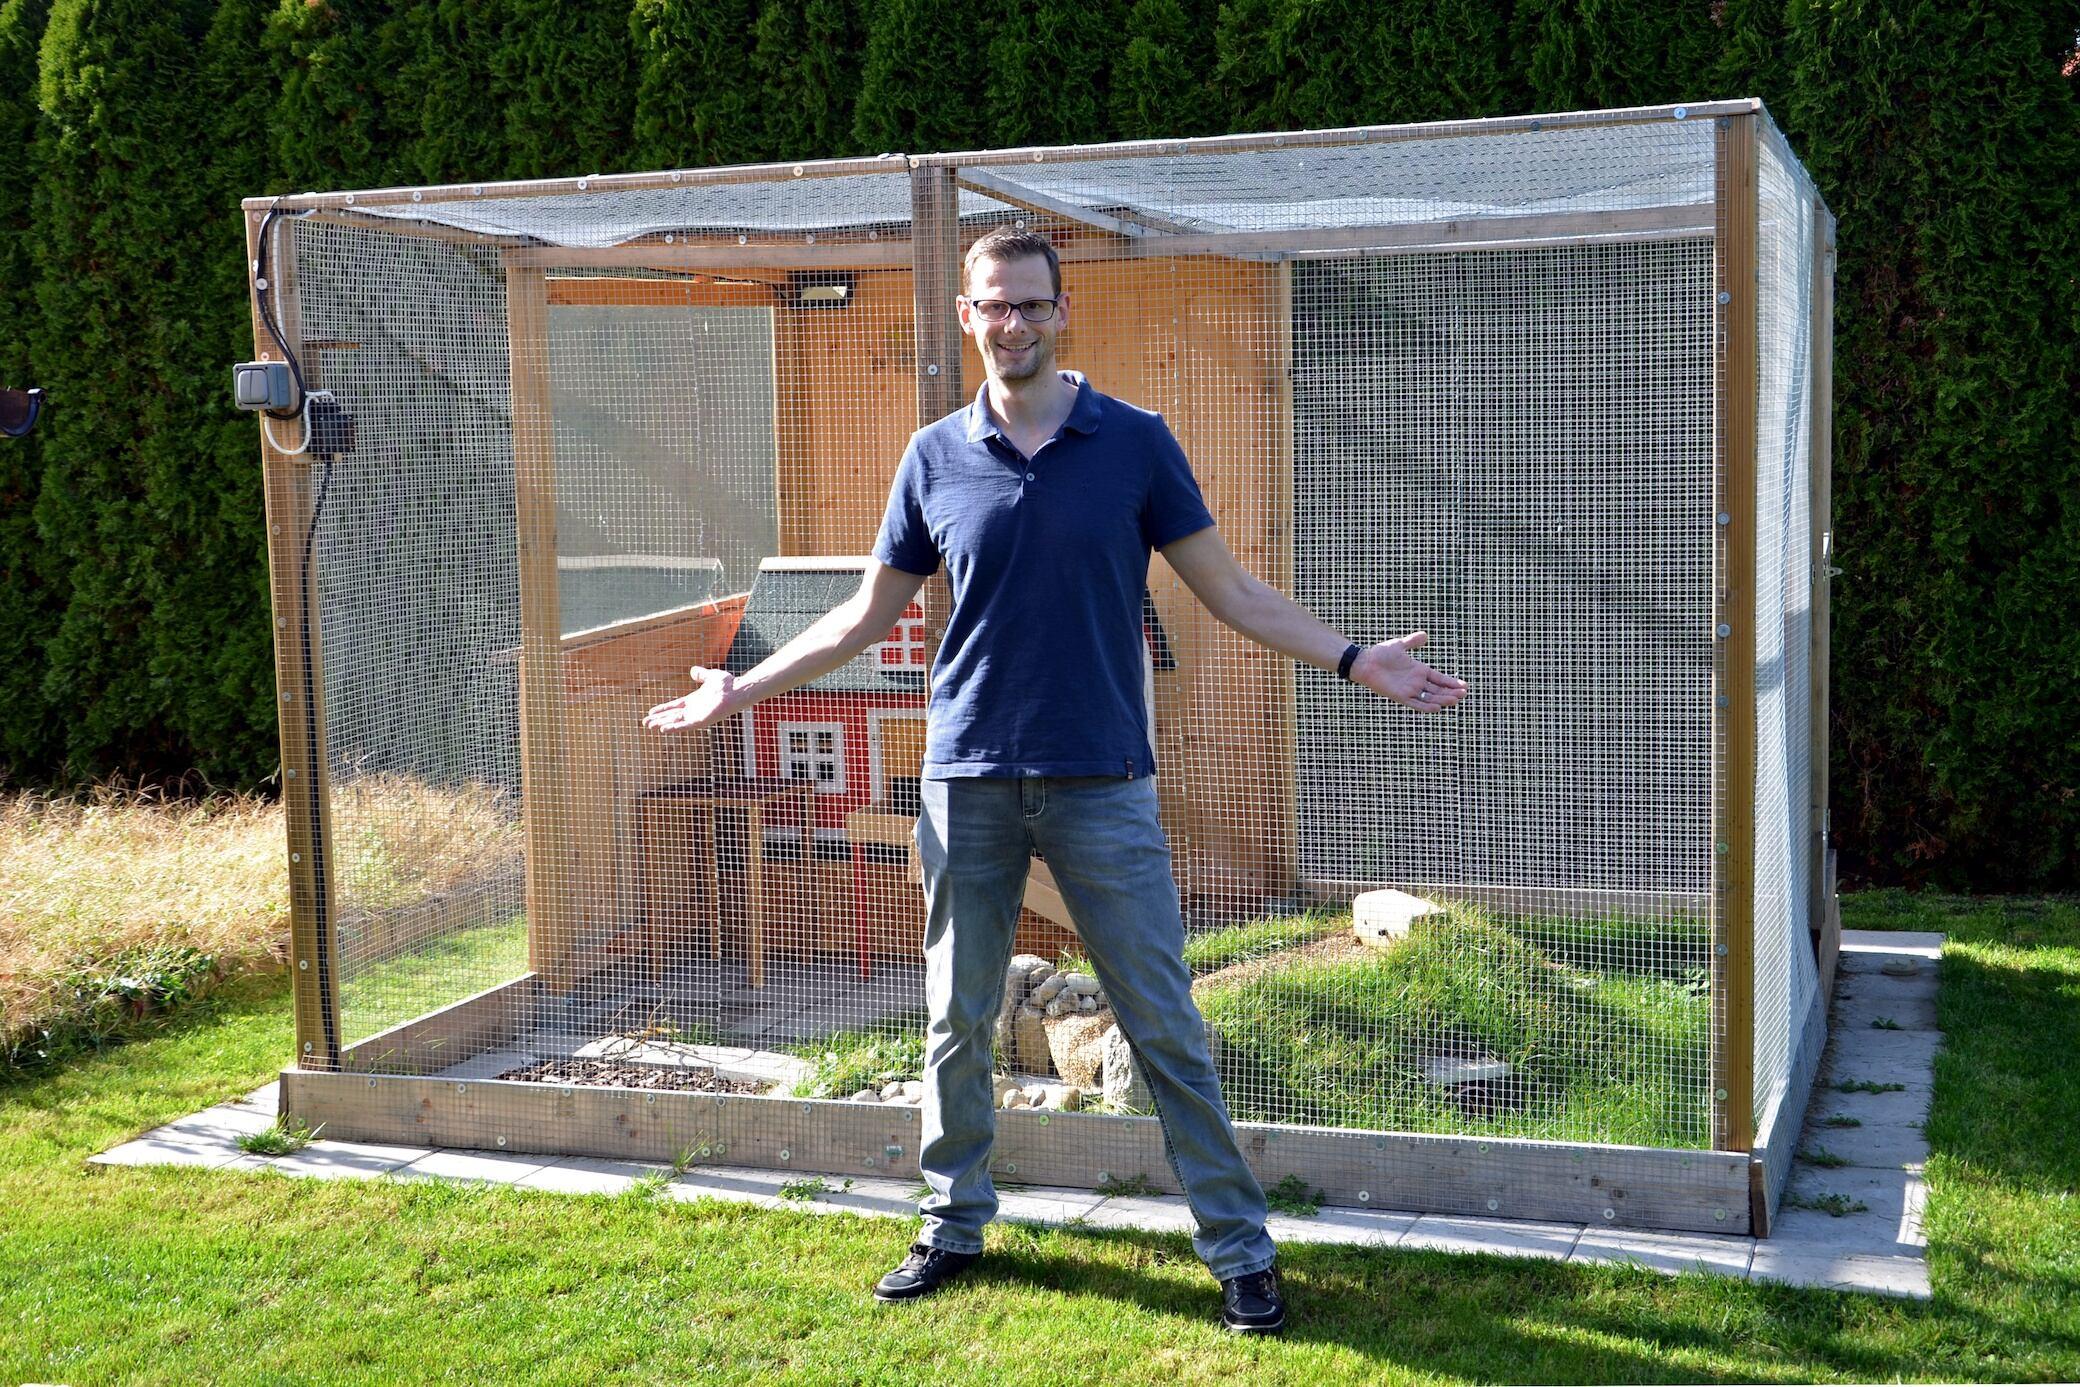 Leser Florian zeigt sein bestes DIY-Projekt